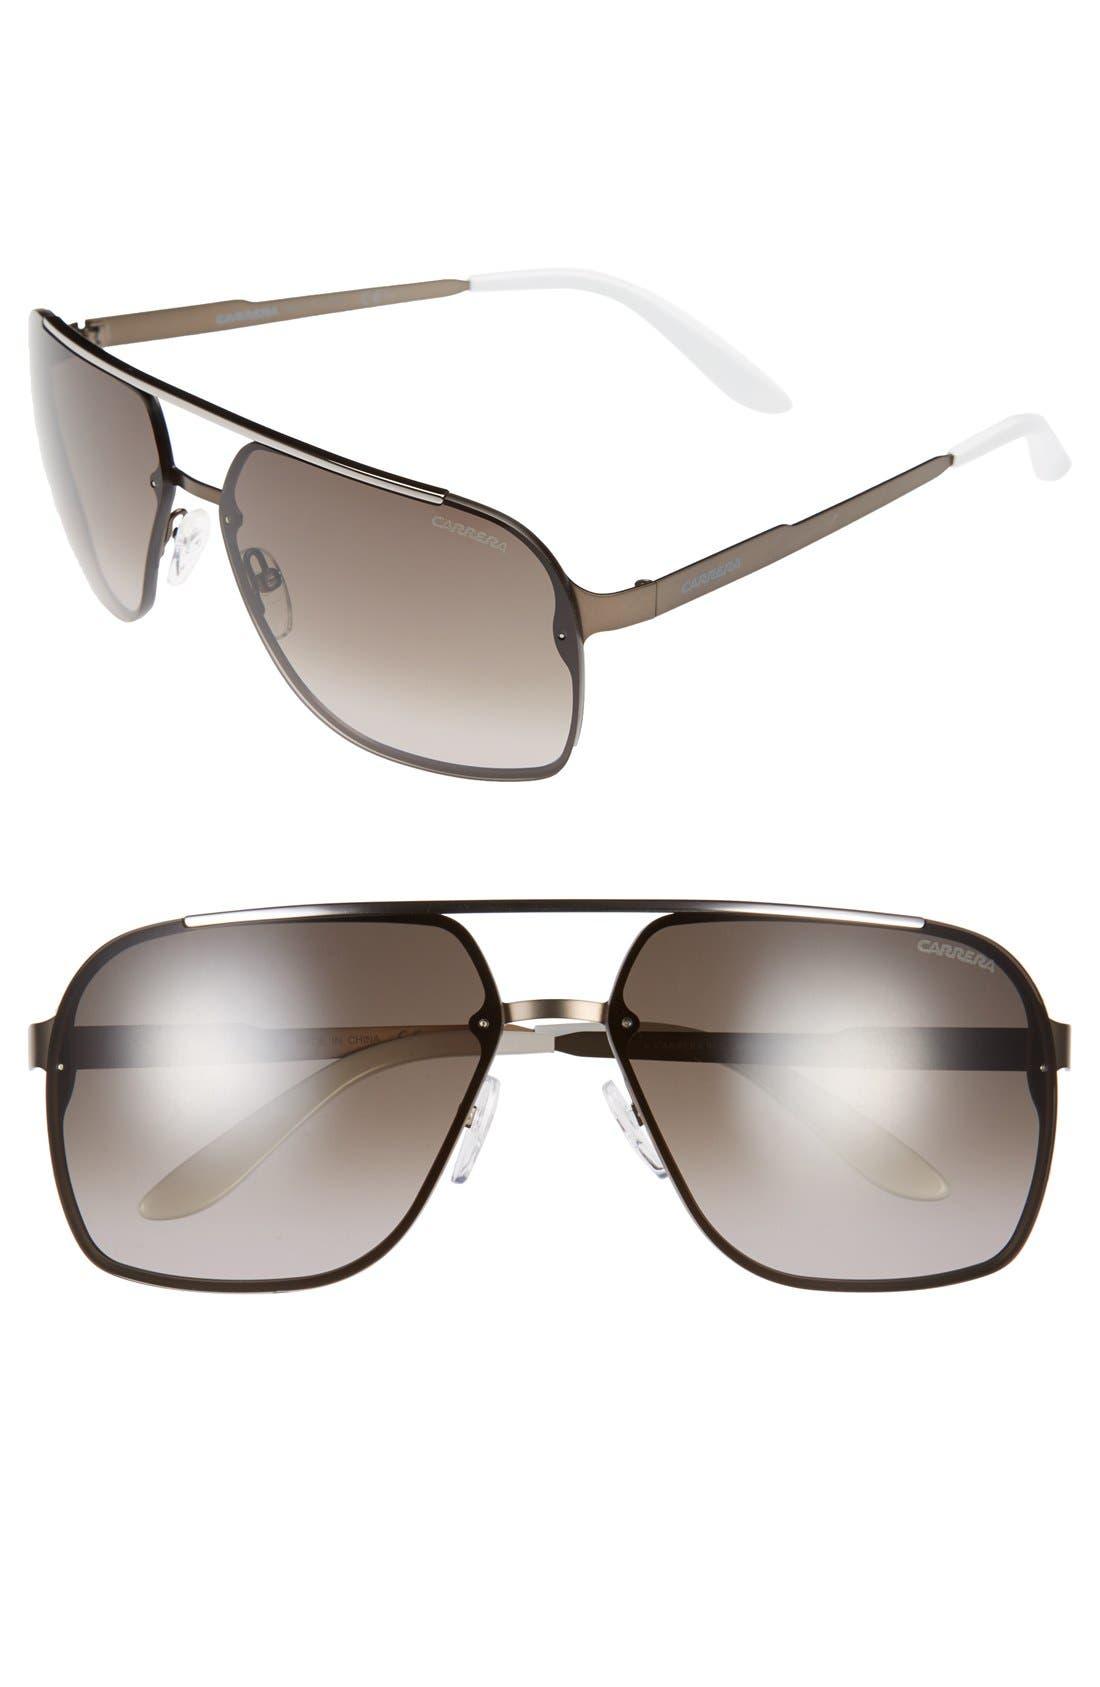 Carrera Eyewear Navigator Sunglasses - Matte Brown/ Brown Gradient